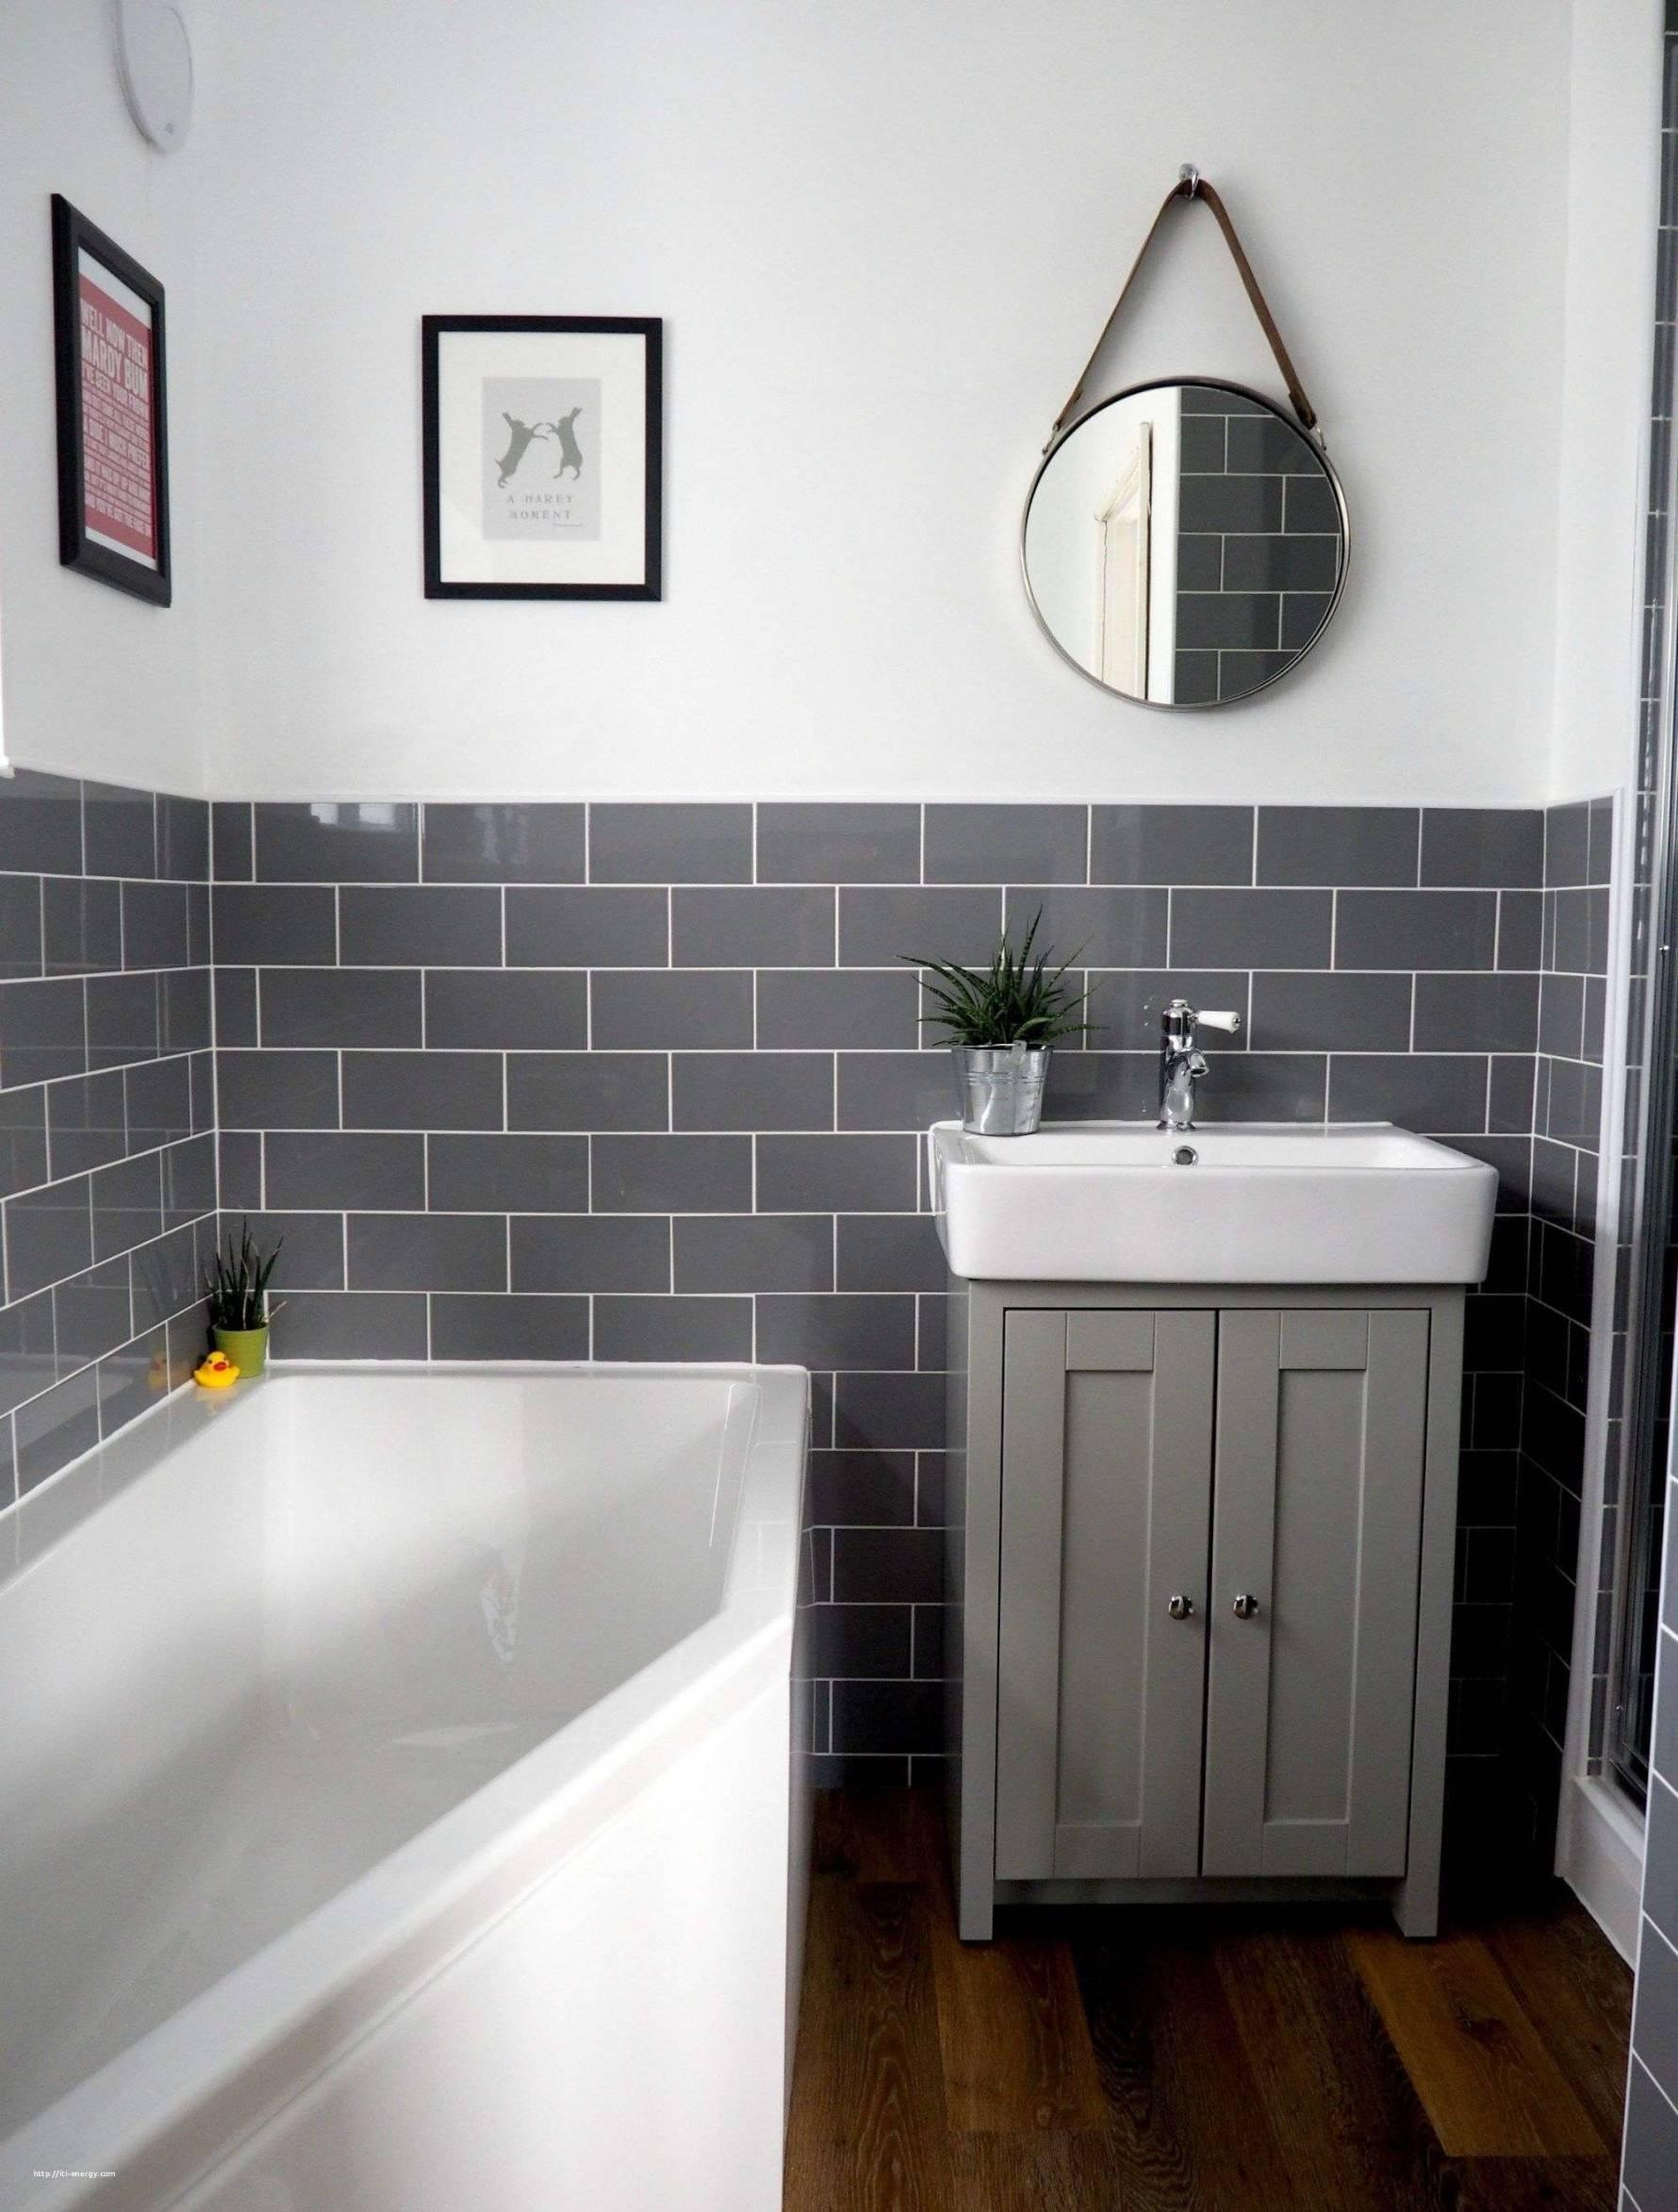 rustic bathroom master bath vanity ideas neobiota2016 of rustic bathroom